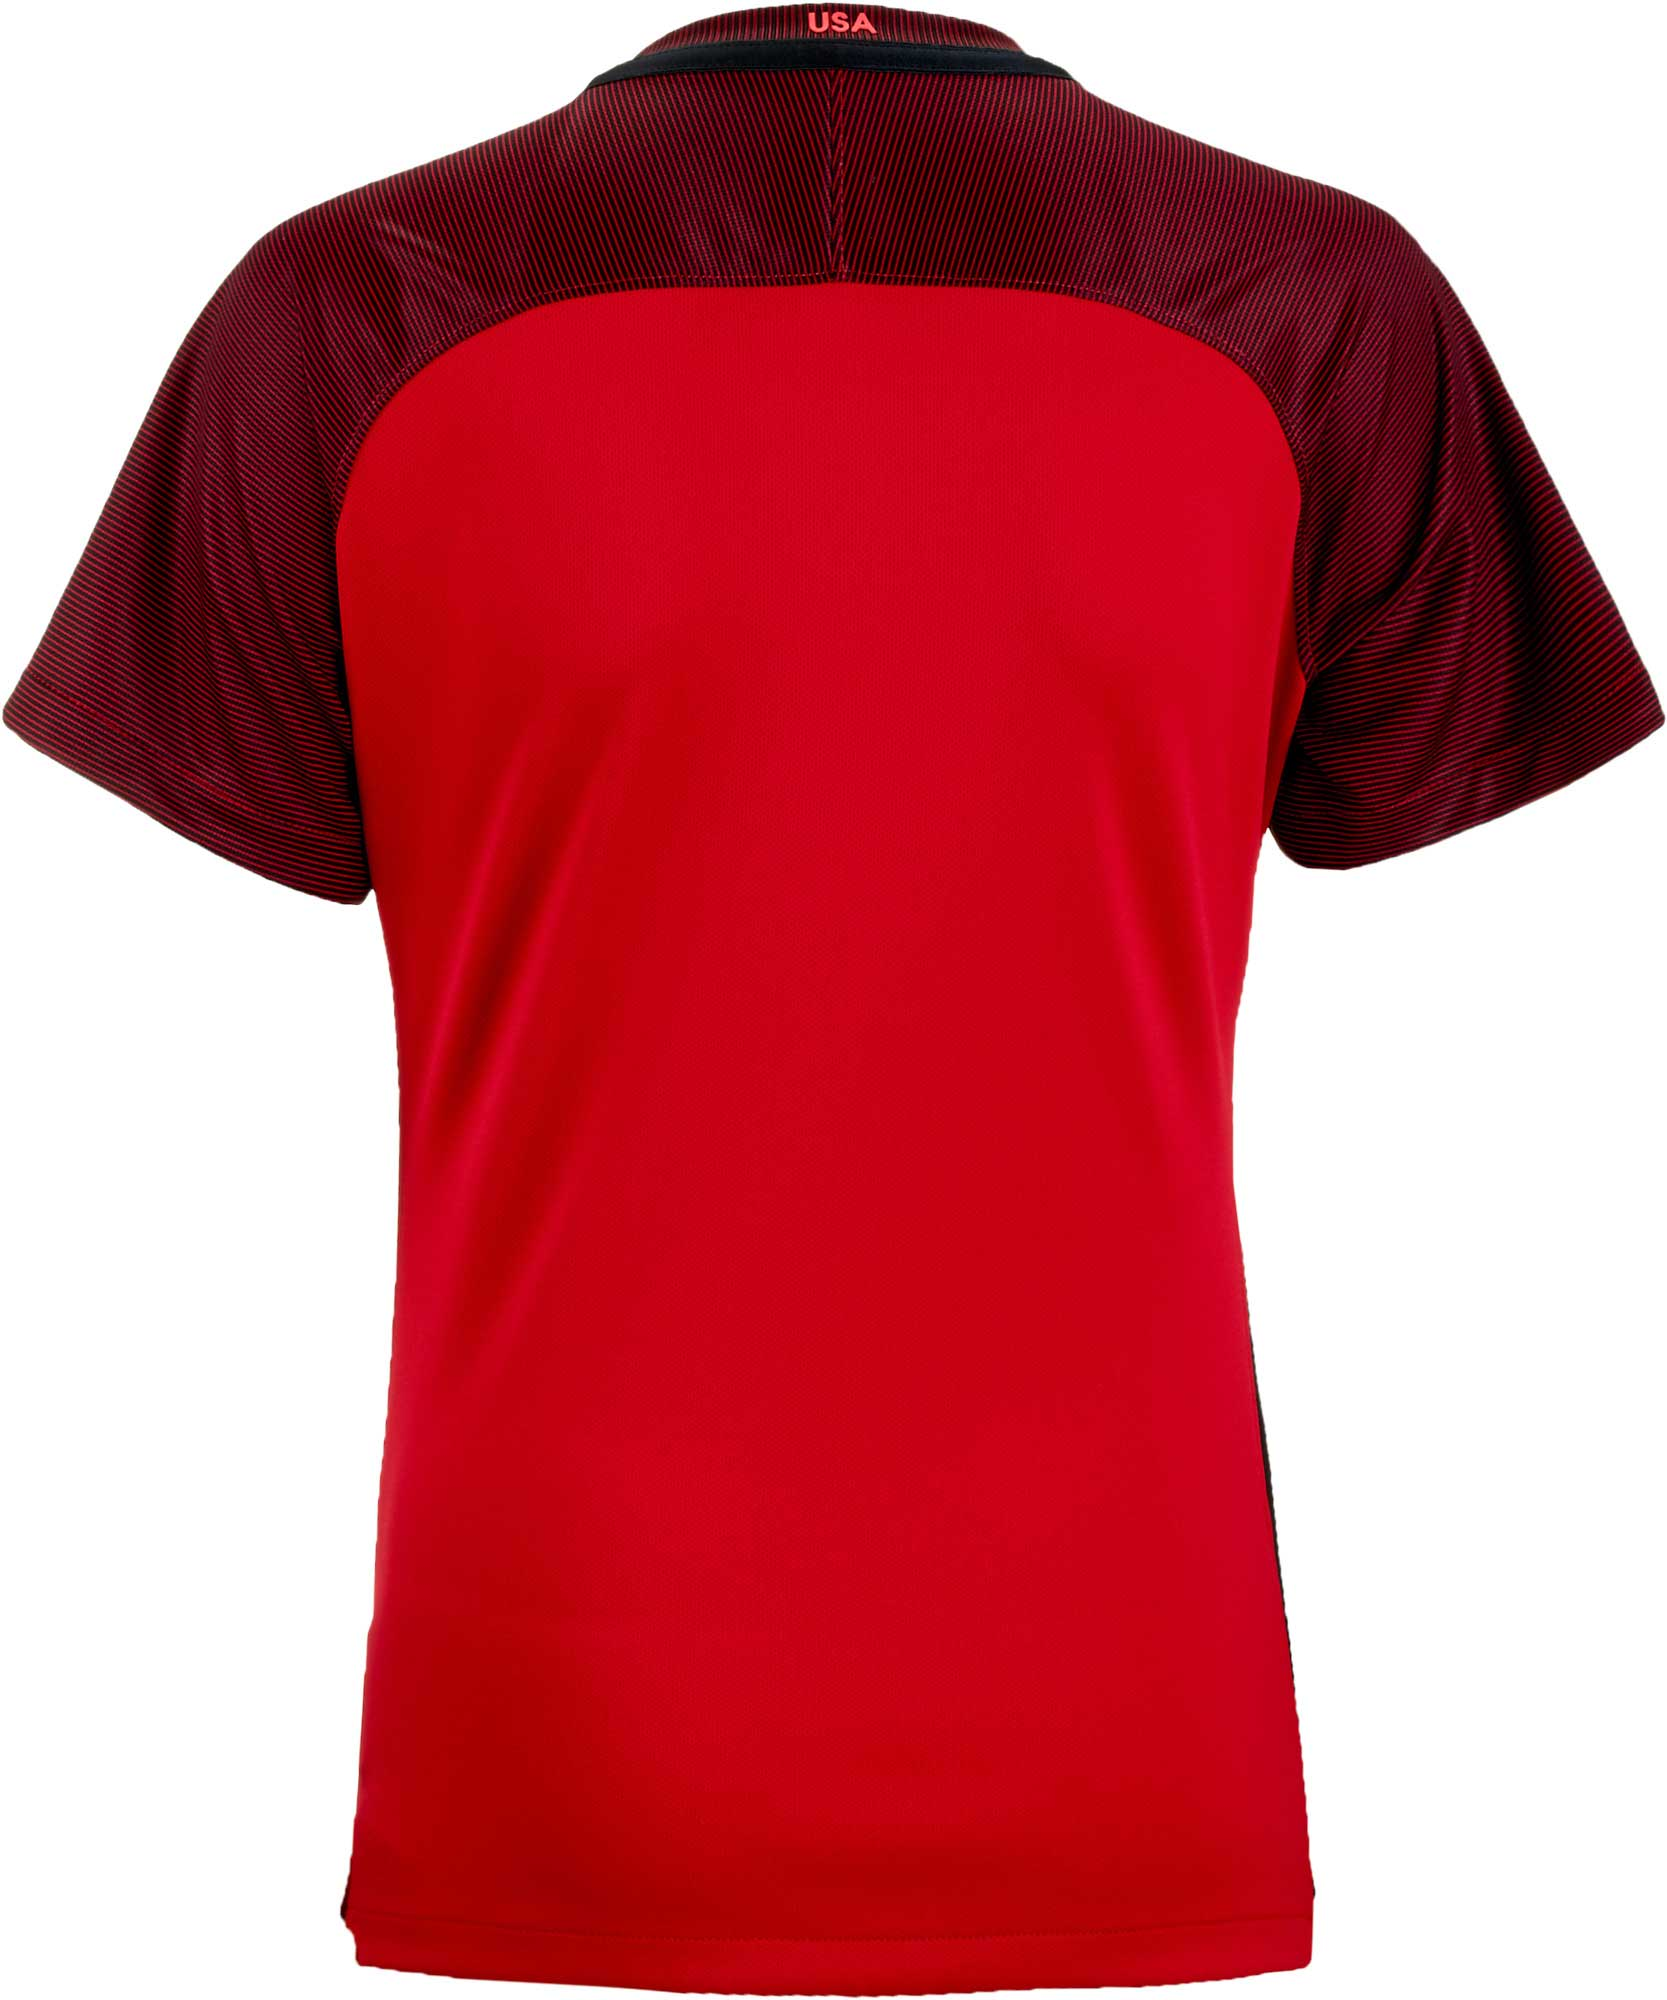 Nike Womens USA 3rd Jersey - 2017 USA Soccer Jerseys